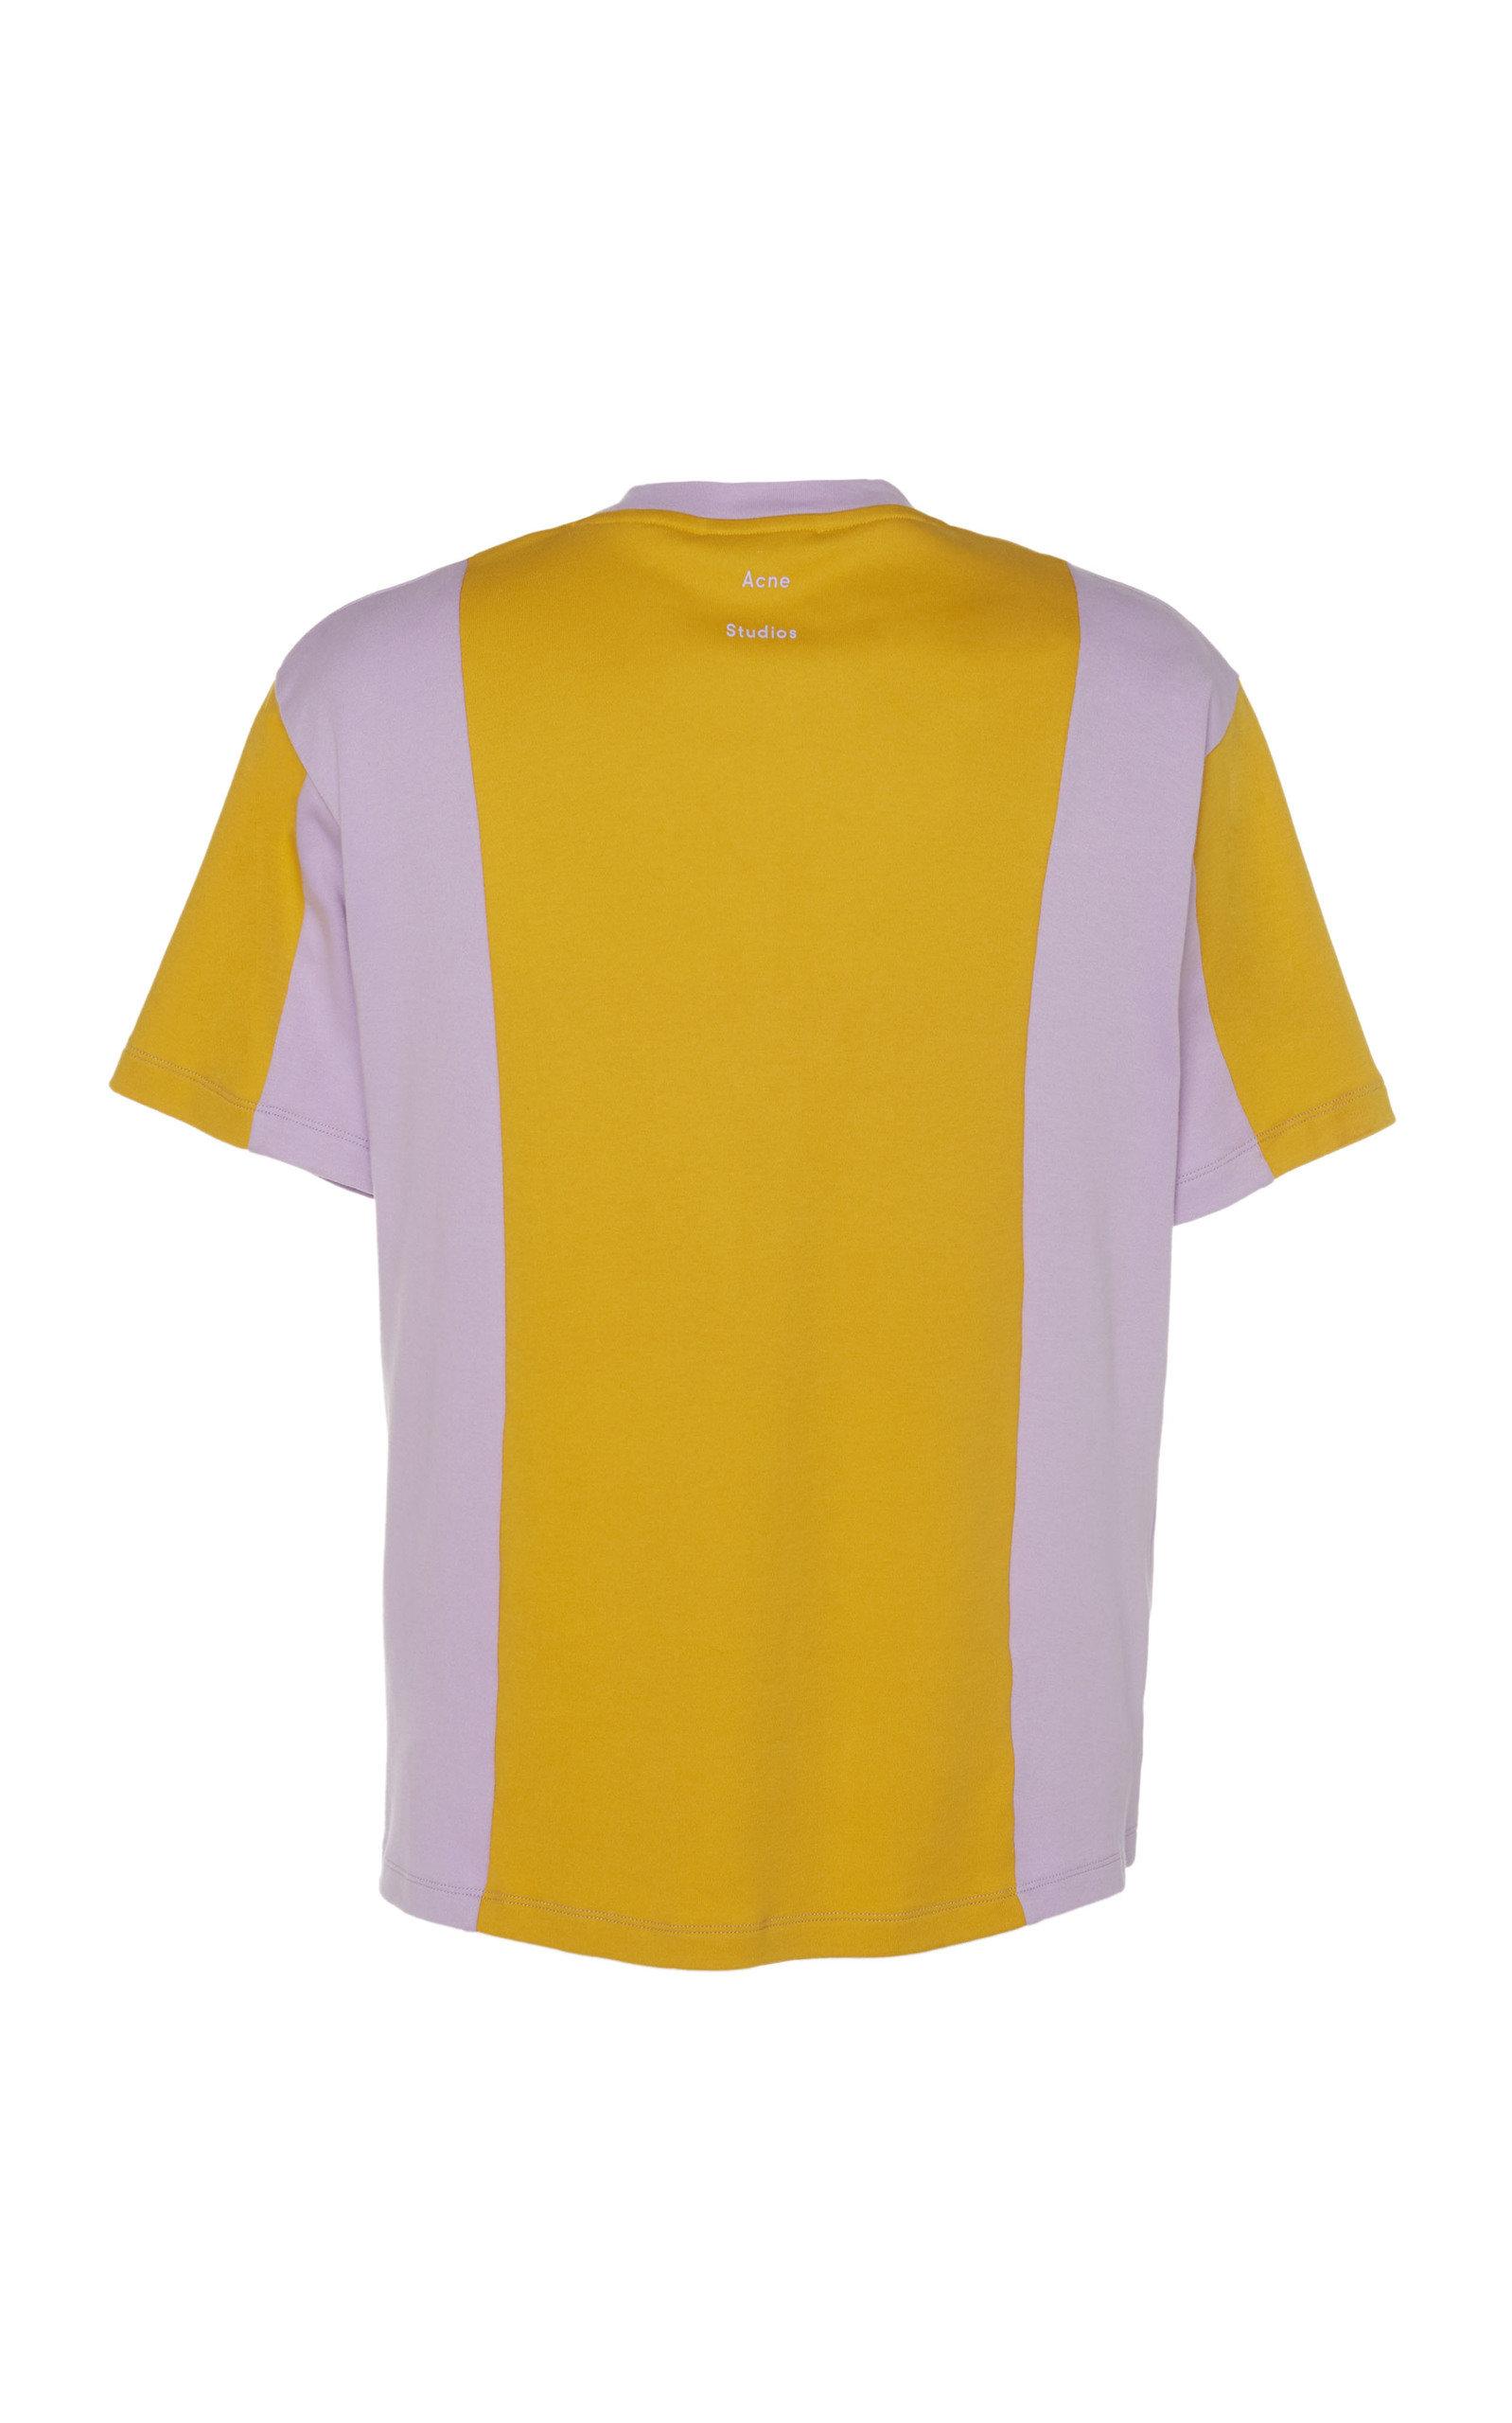 ACNE STUDIOS Shirts Two-Tone Cotton-Jersey T-Shirt